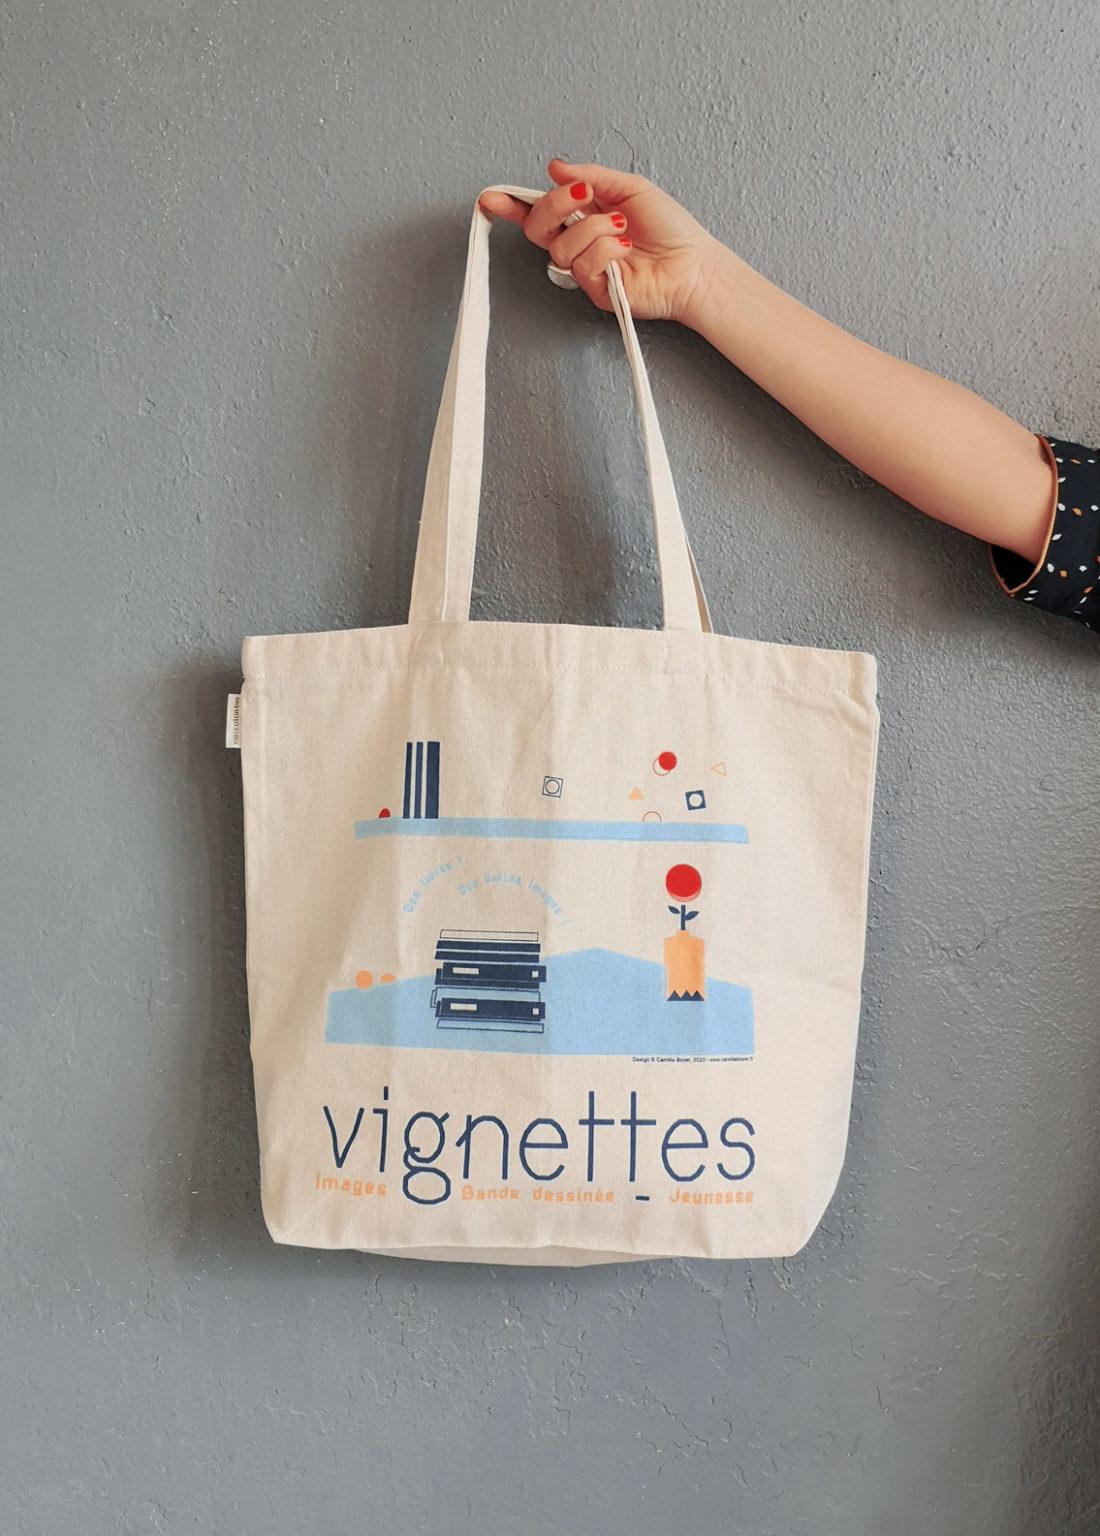 Miniature Librairie Vignettes